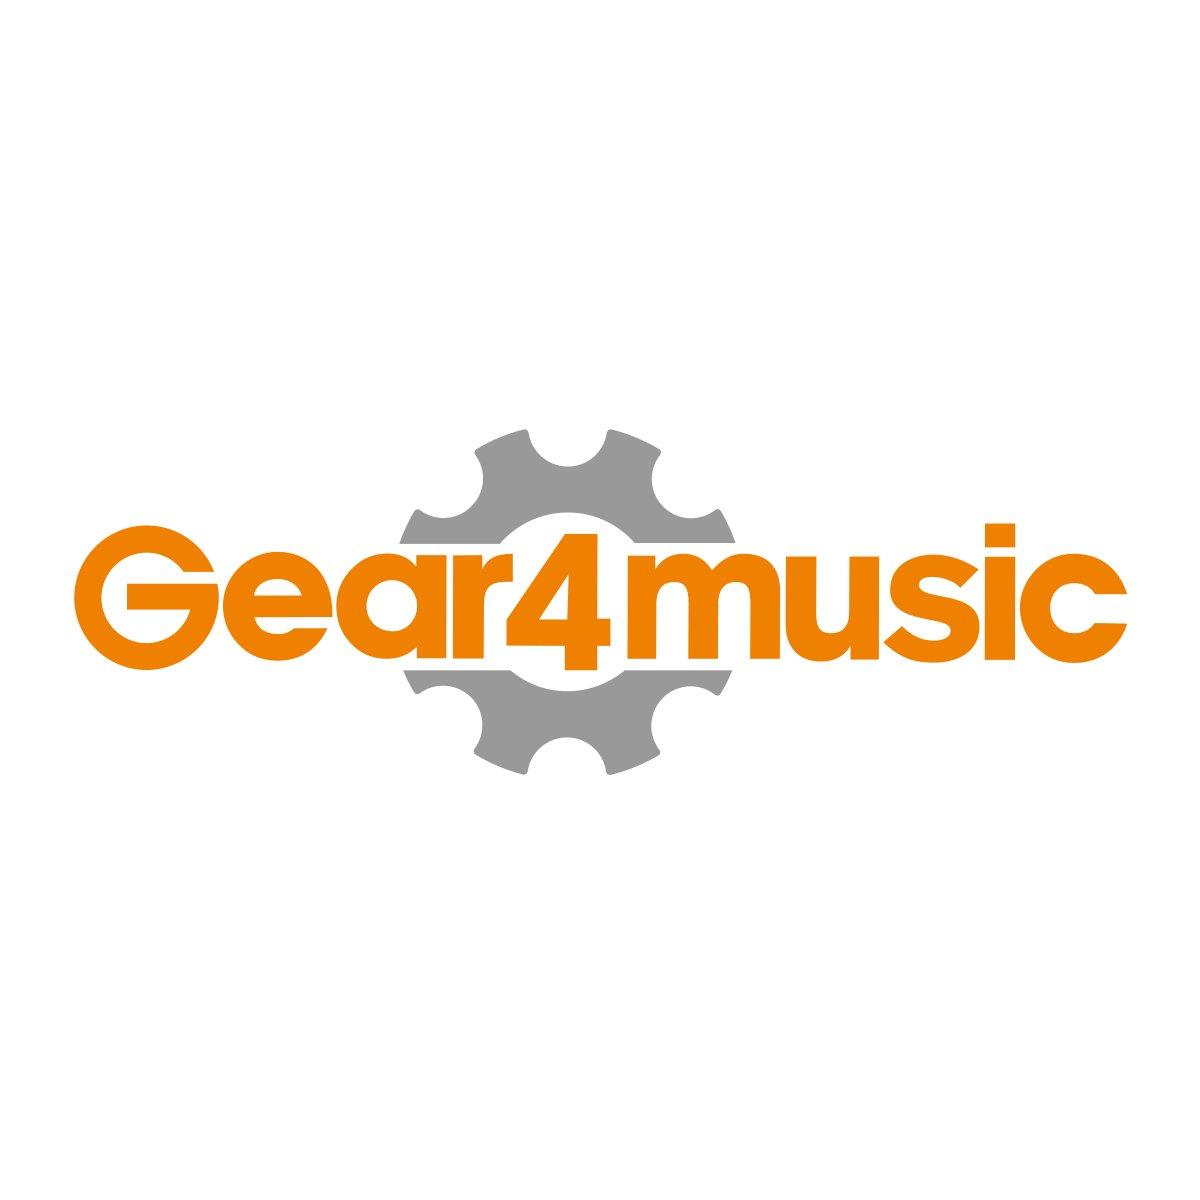 LA električna kitara za levičarje/ke od Gear4music